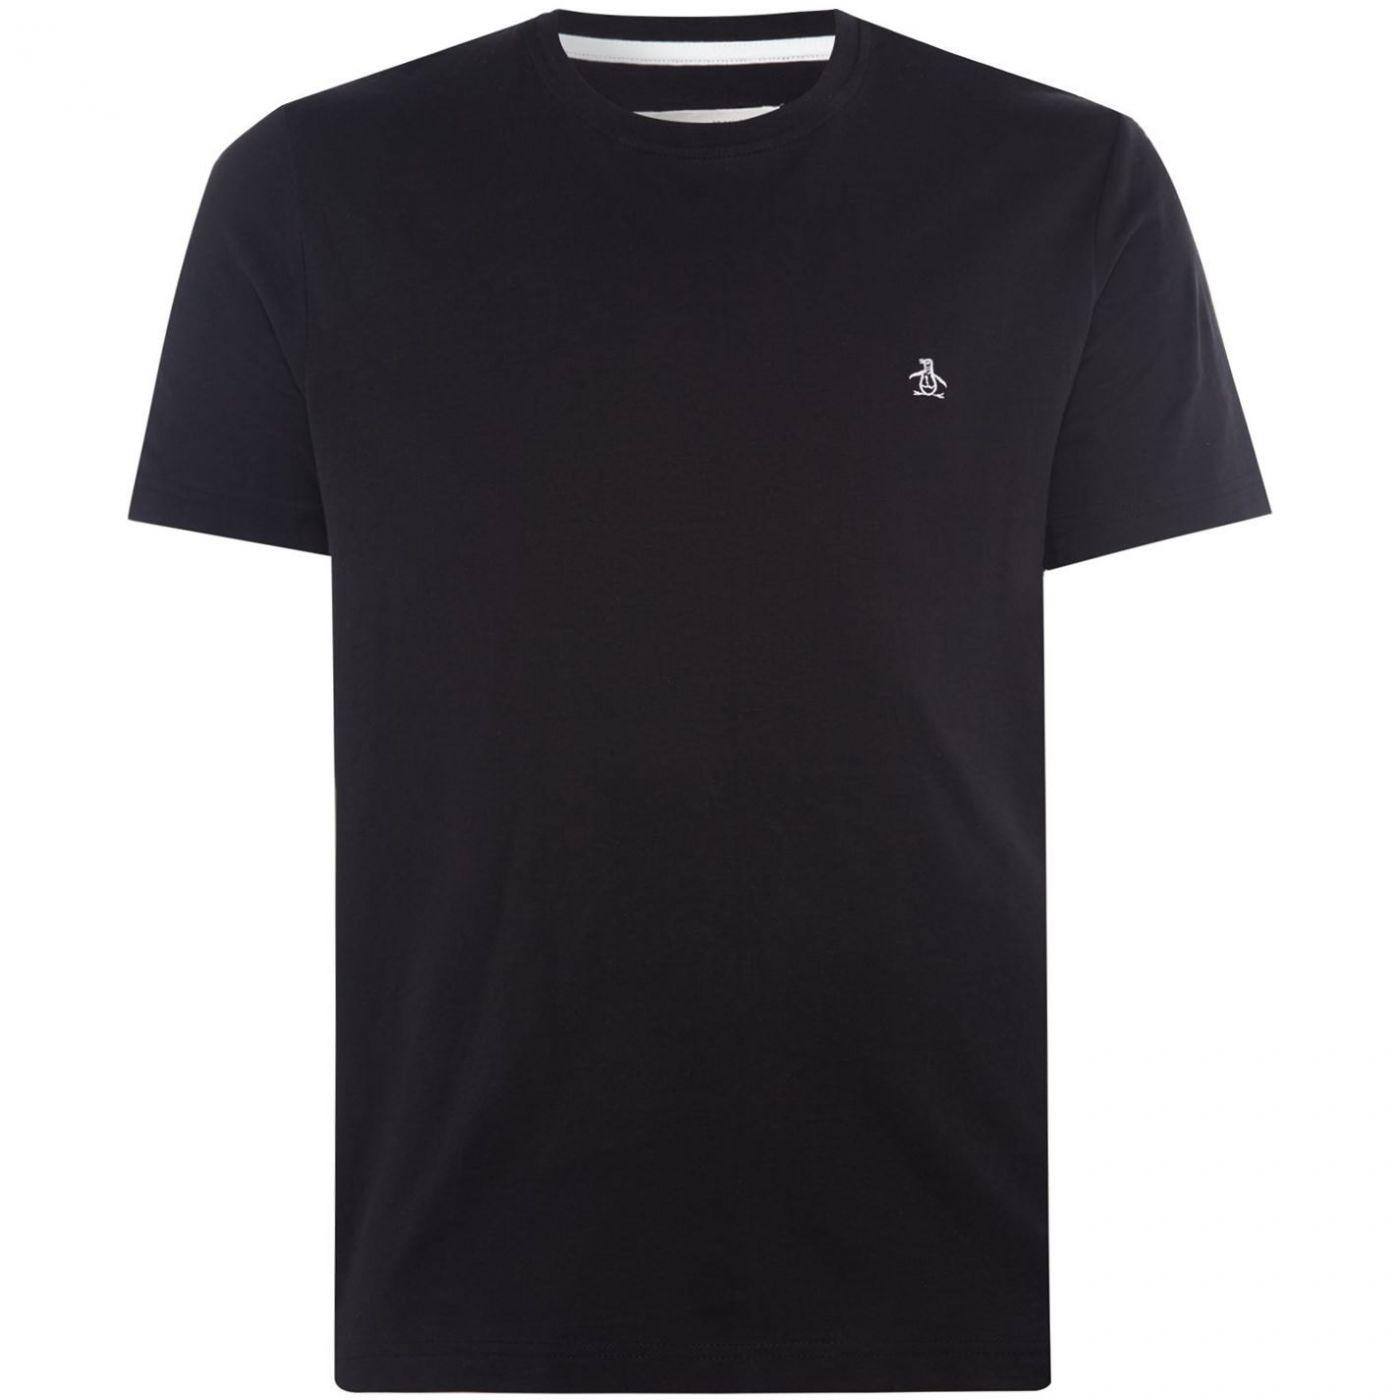 Original Penguin Pin Point Crew Neck T-Shirt